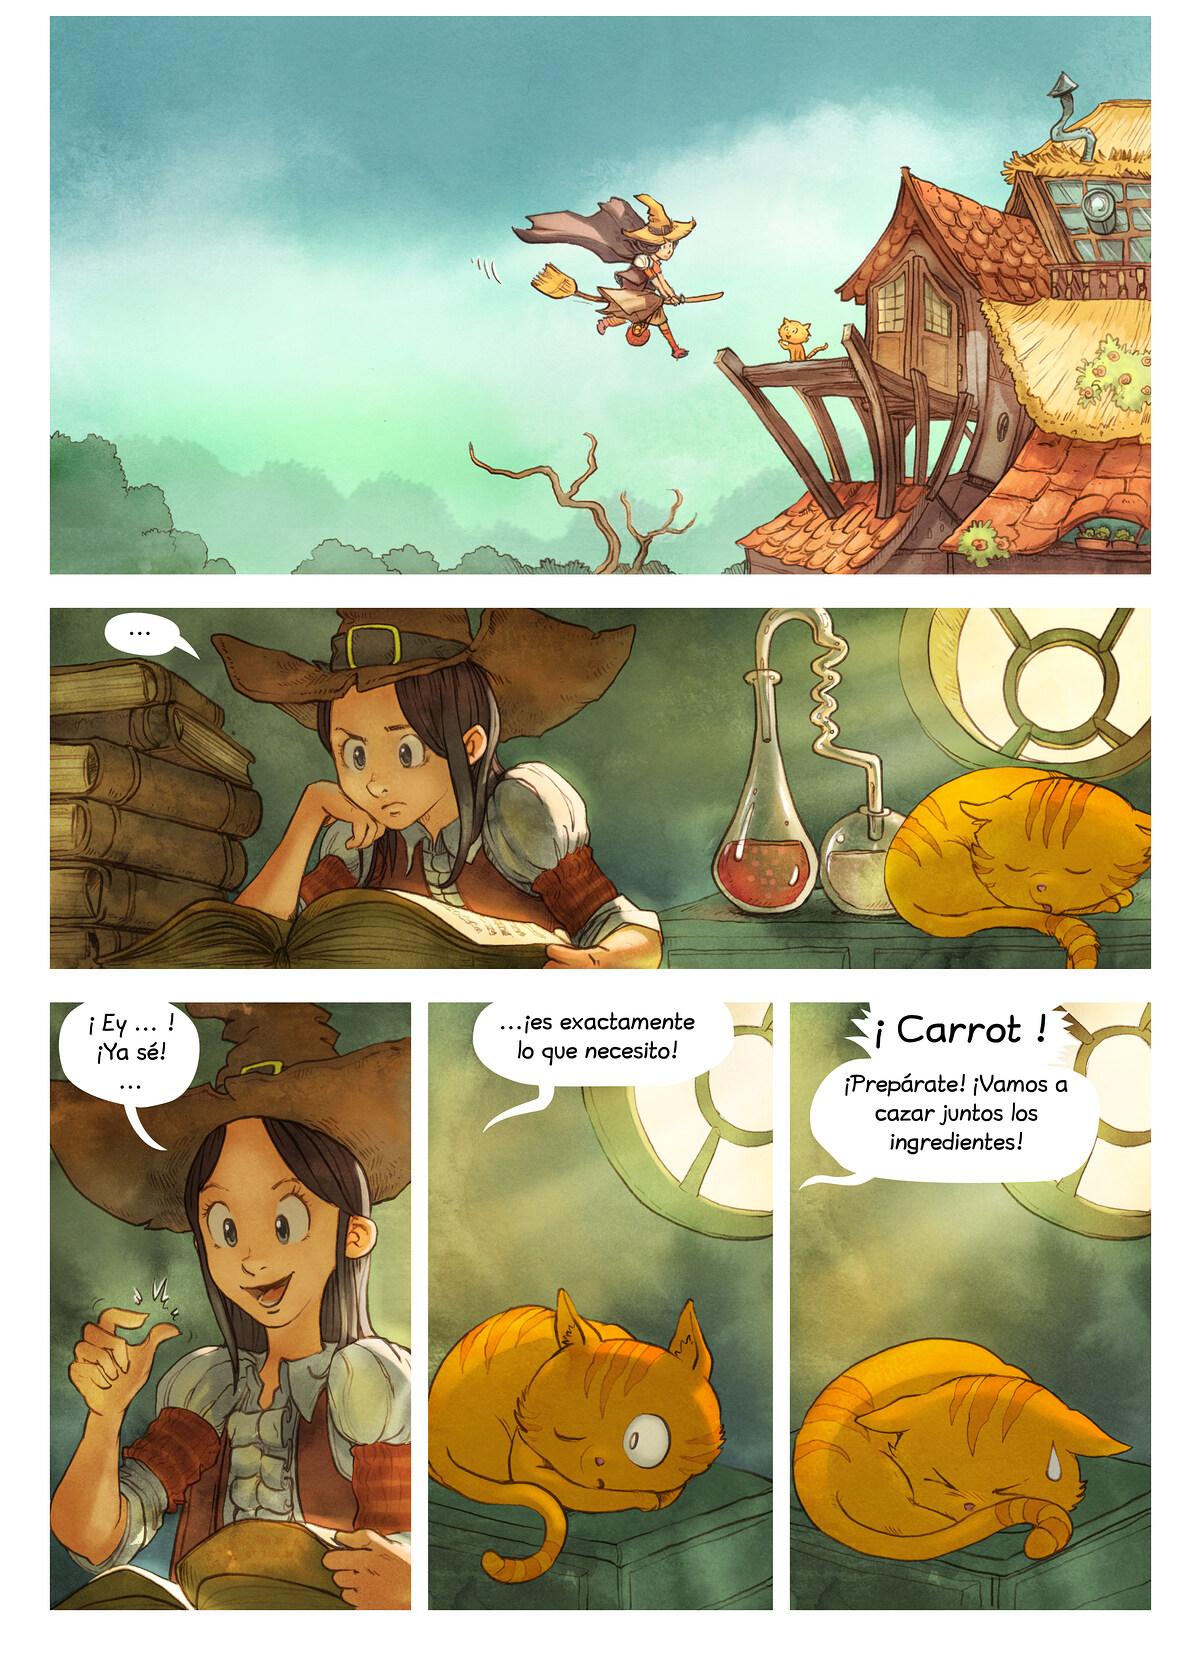 A webcomic page of Pepper&Carrot, episodio 4 , página 4